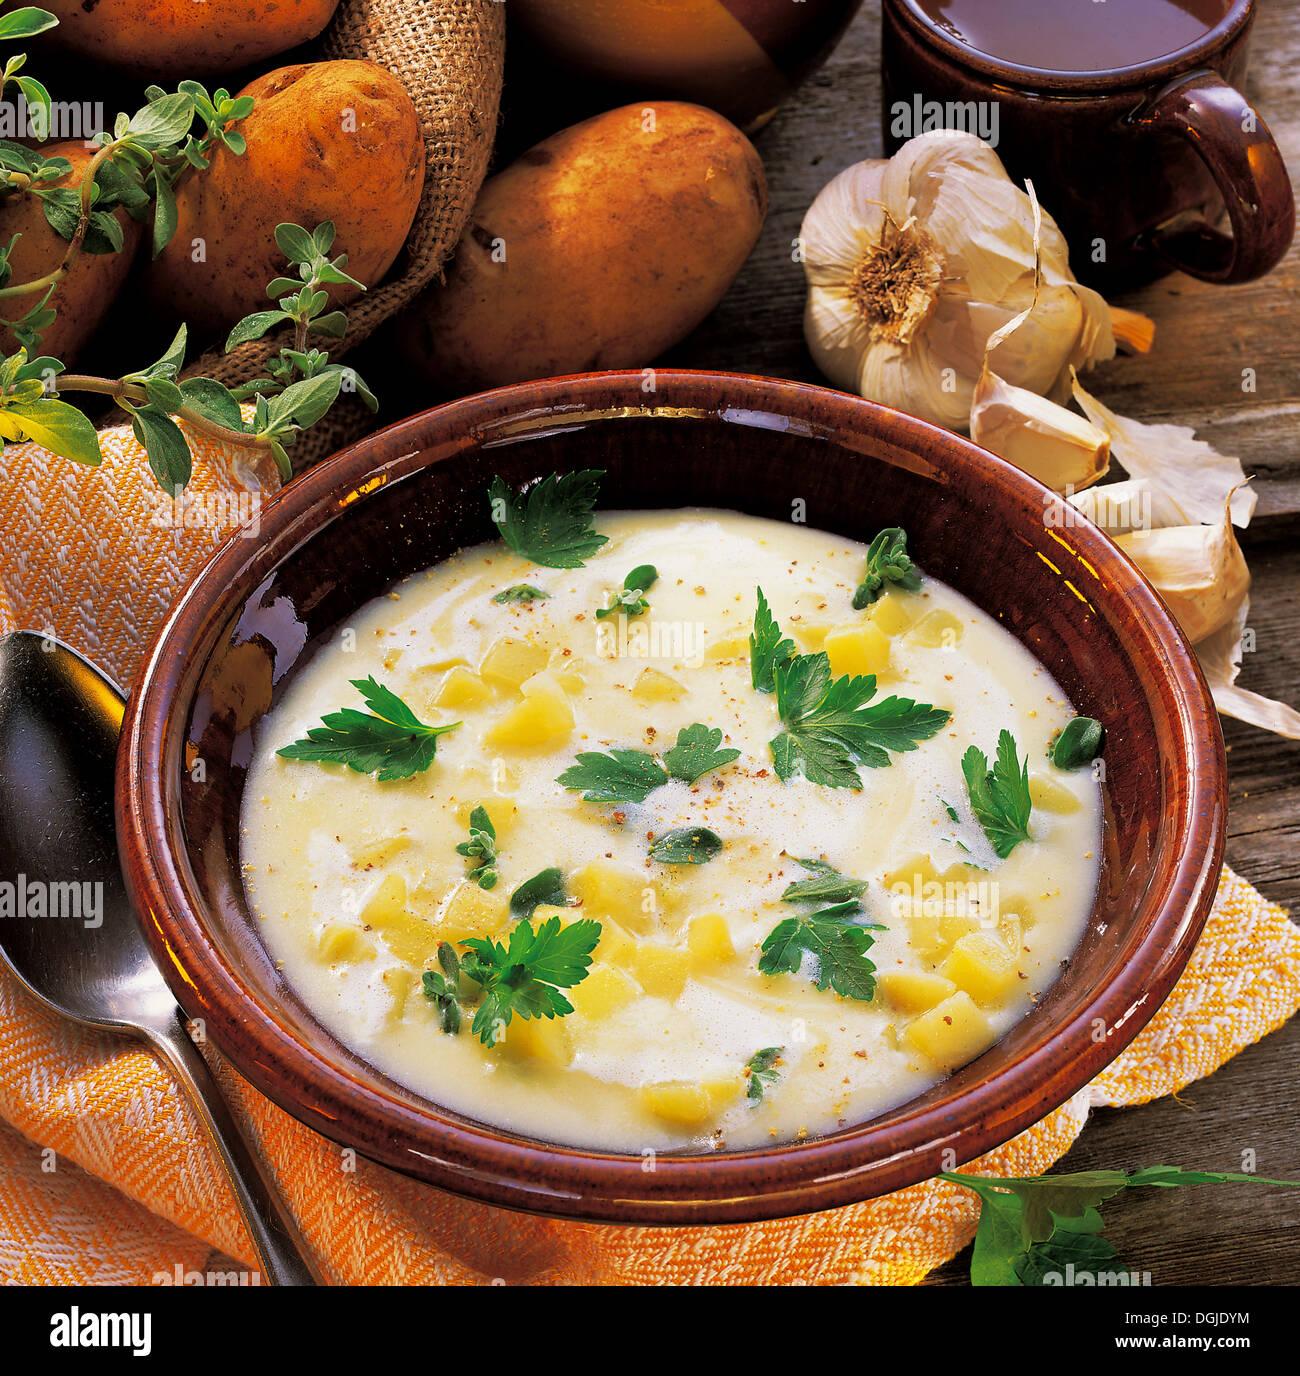 Light Potato Soup, Germany, Recipe Available For A Fee